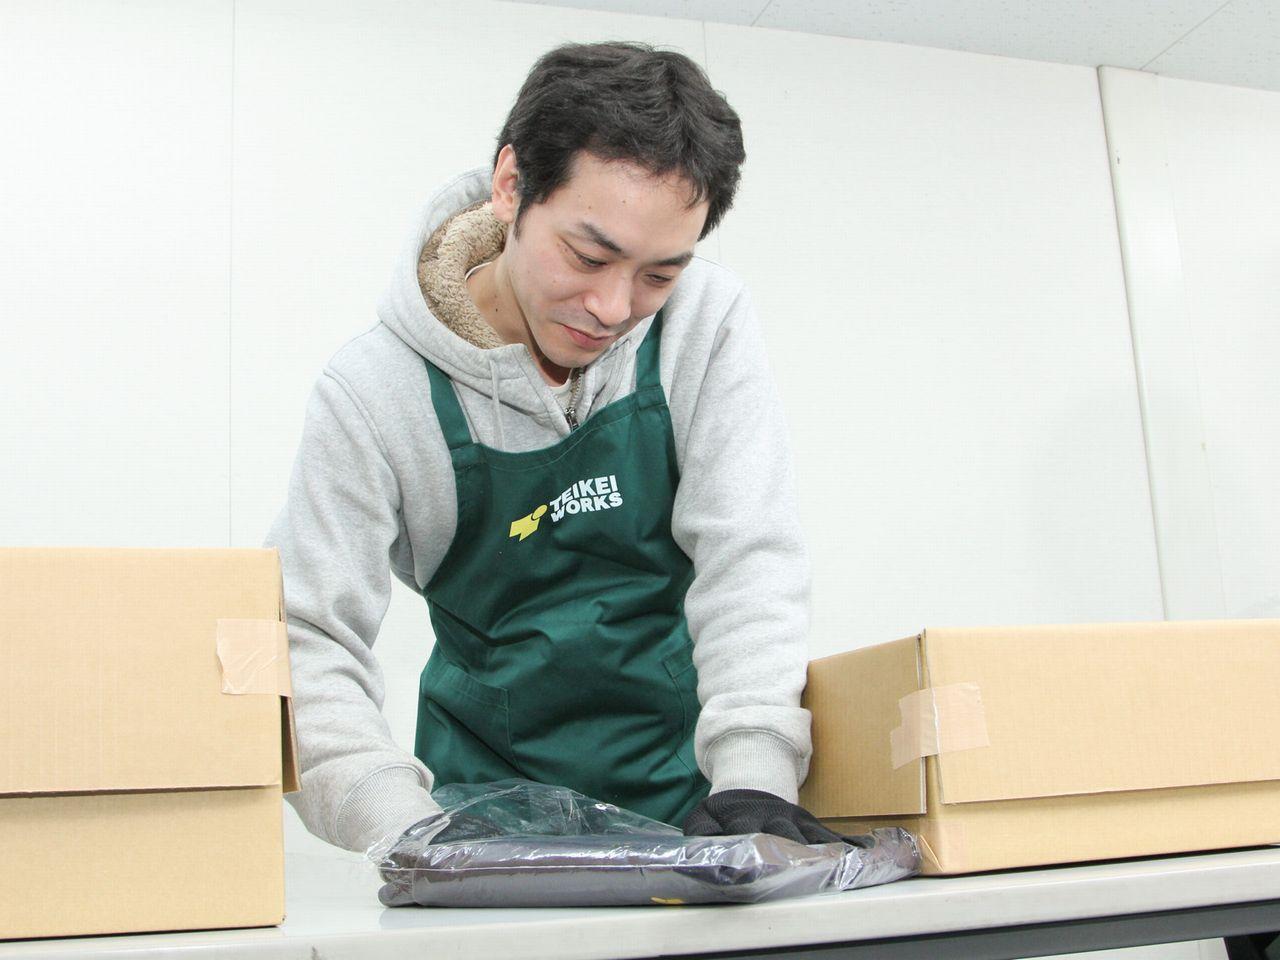 teikeiworksTOKYO 成田支店のアルバイト情報